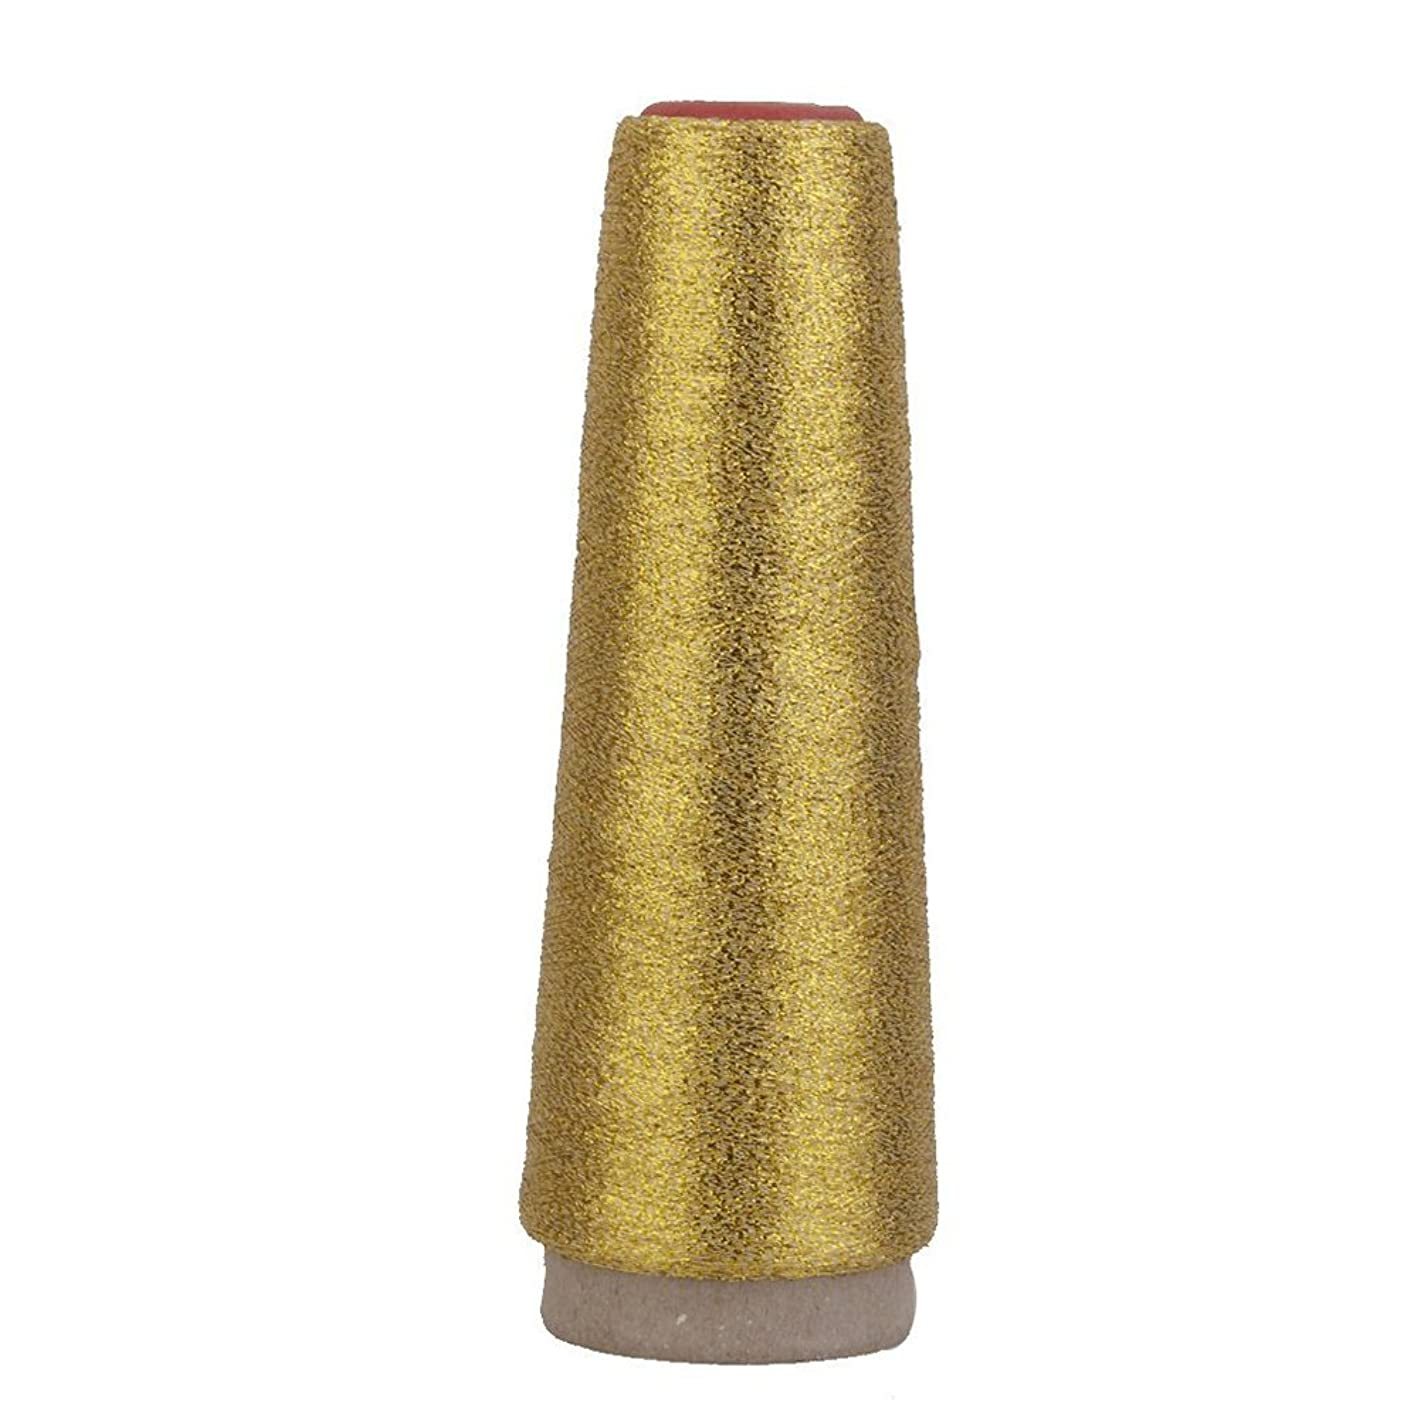 UEETEK Metallic 5000 Yards Sewing Embroidery Thread Spool Cord for Machine Brother JUKI PFAFF SINGER JANOME Gold